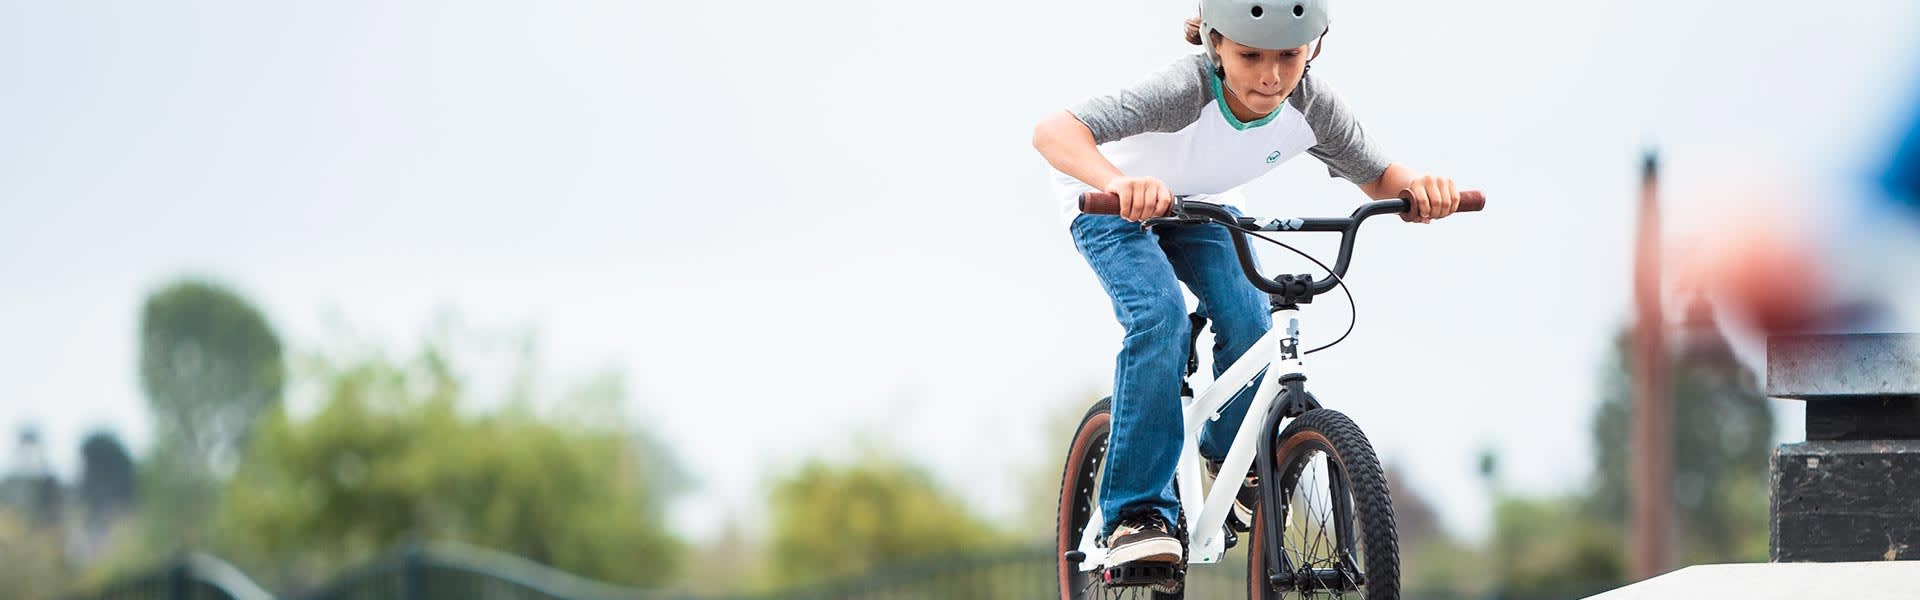 Kids' BMX Bikes